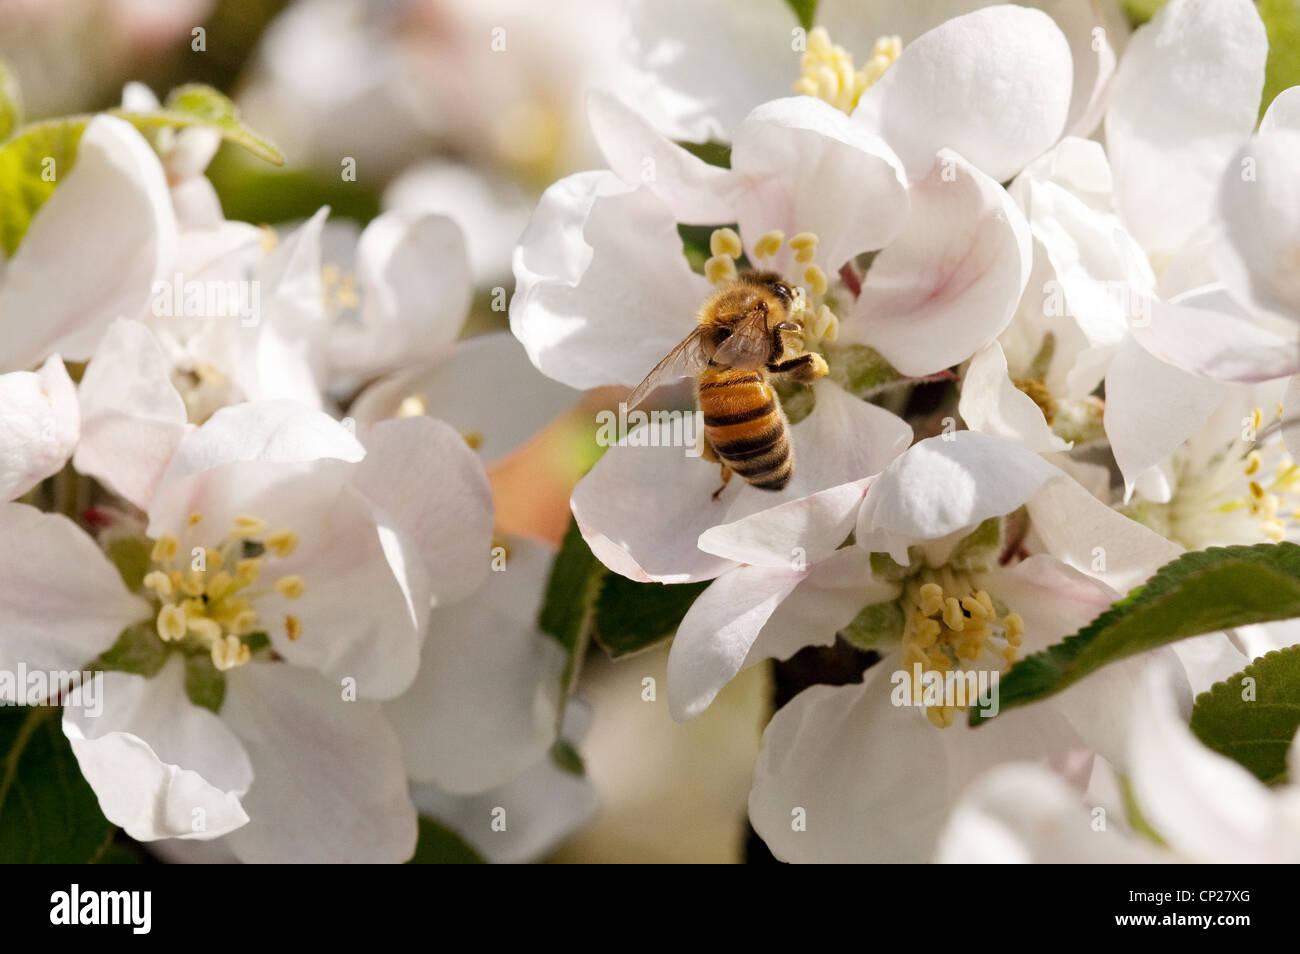 Western Honey Bee (Apis Mellifera) on apple blossom, UK